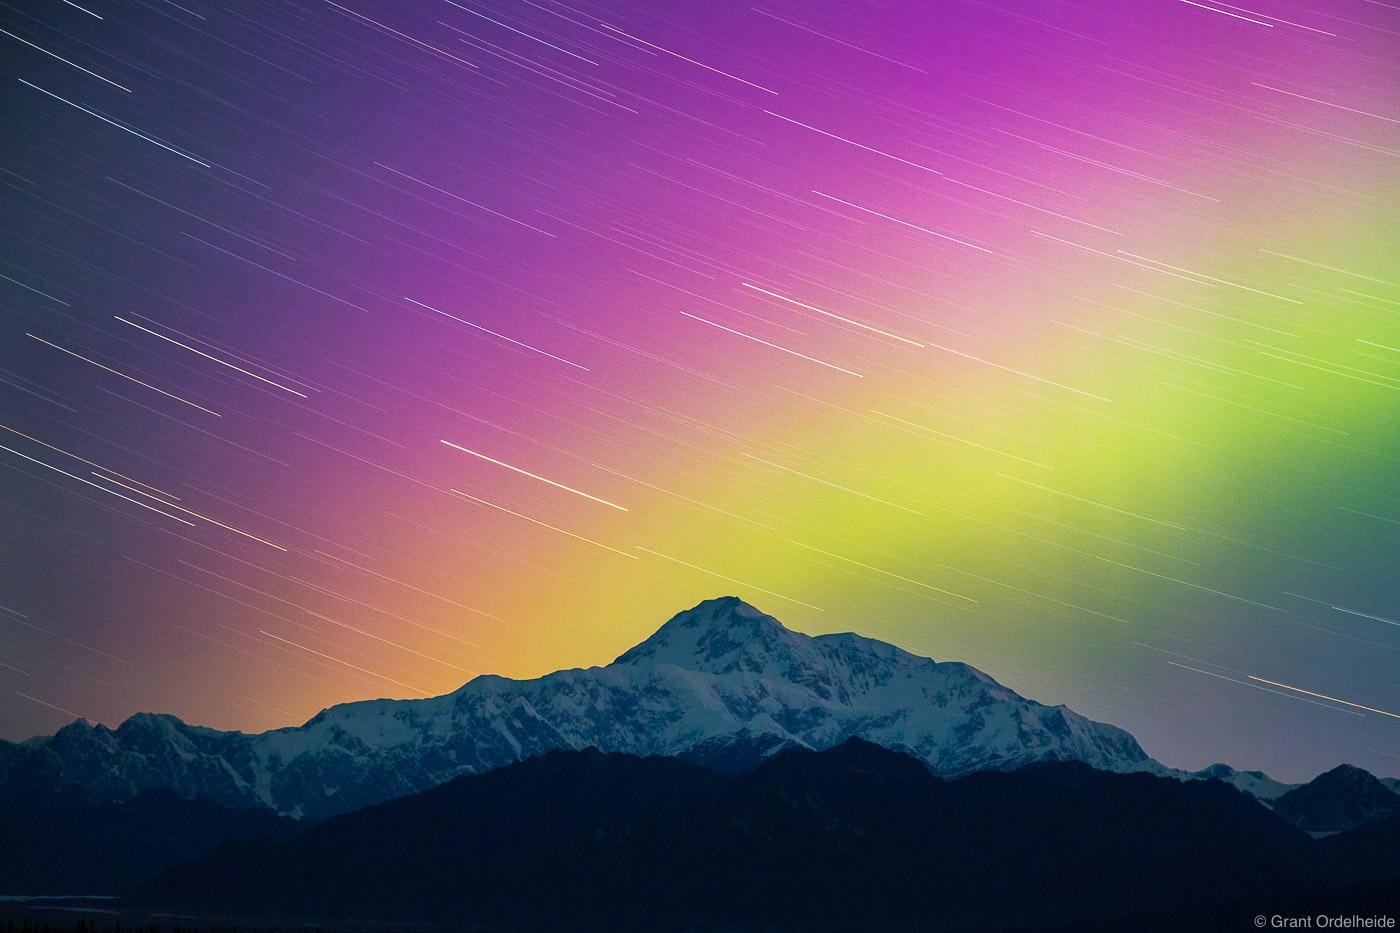 Star trails and aurora borealis over North America's tallest peak.